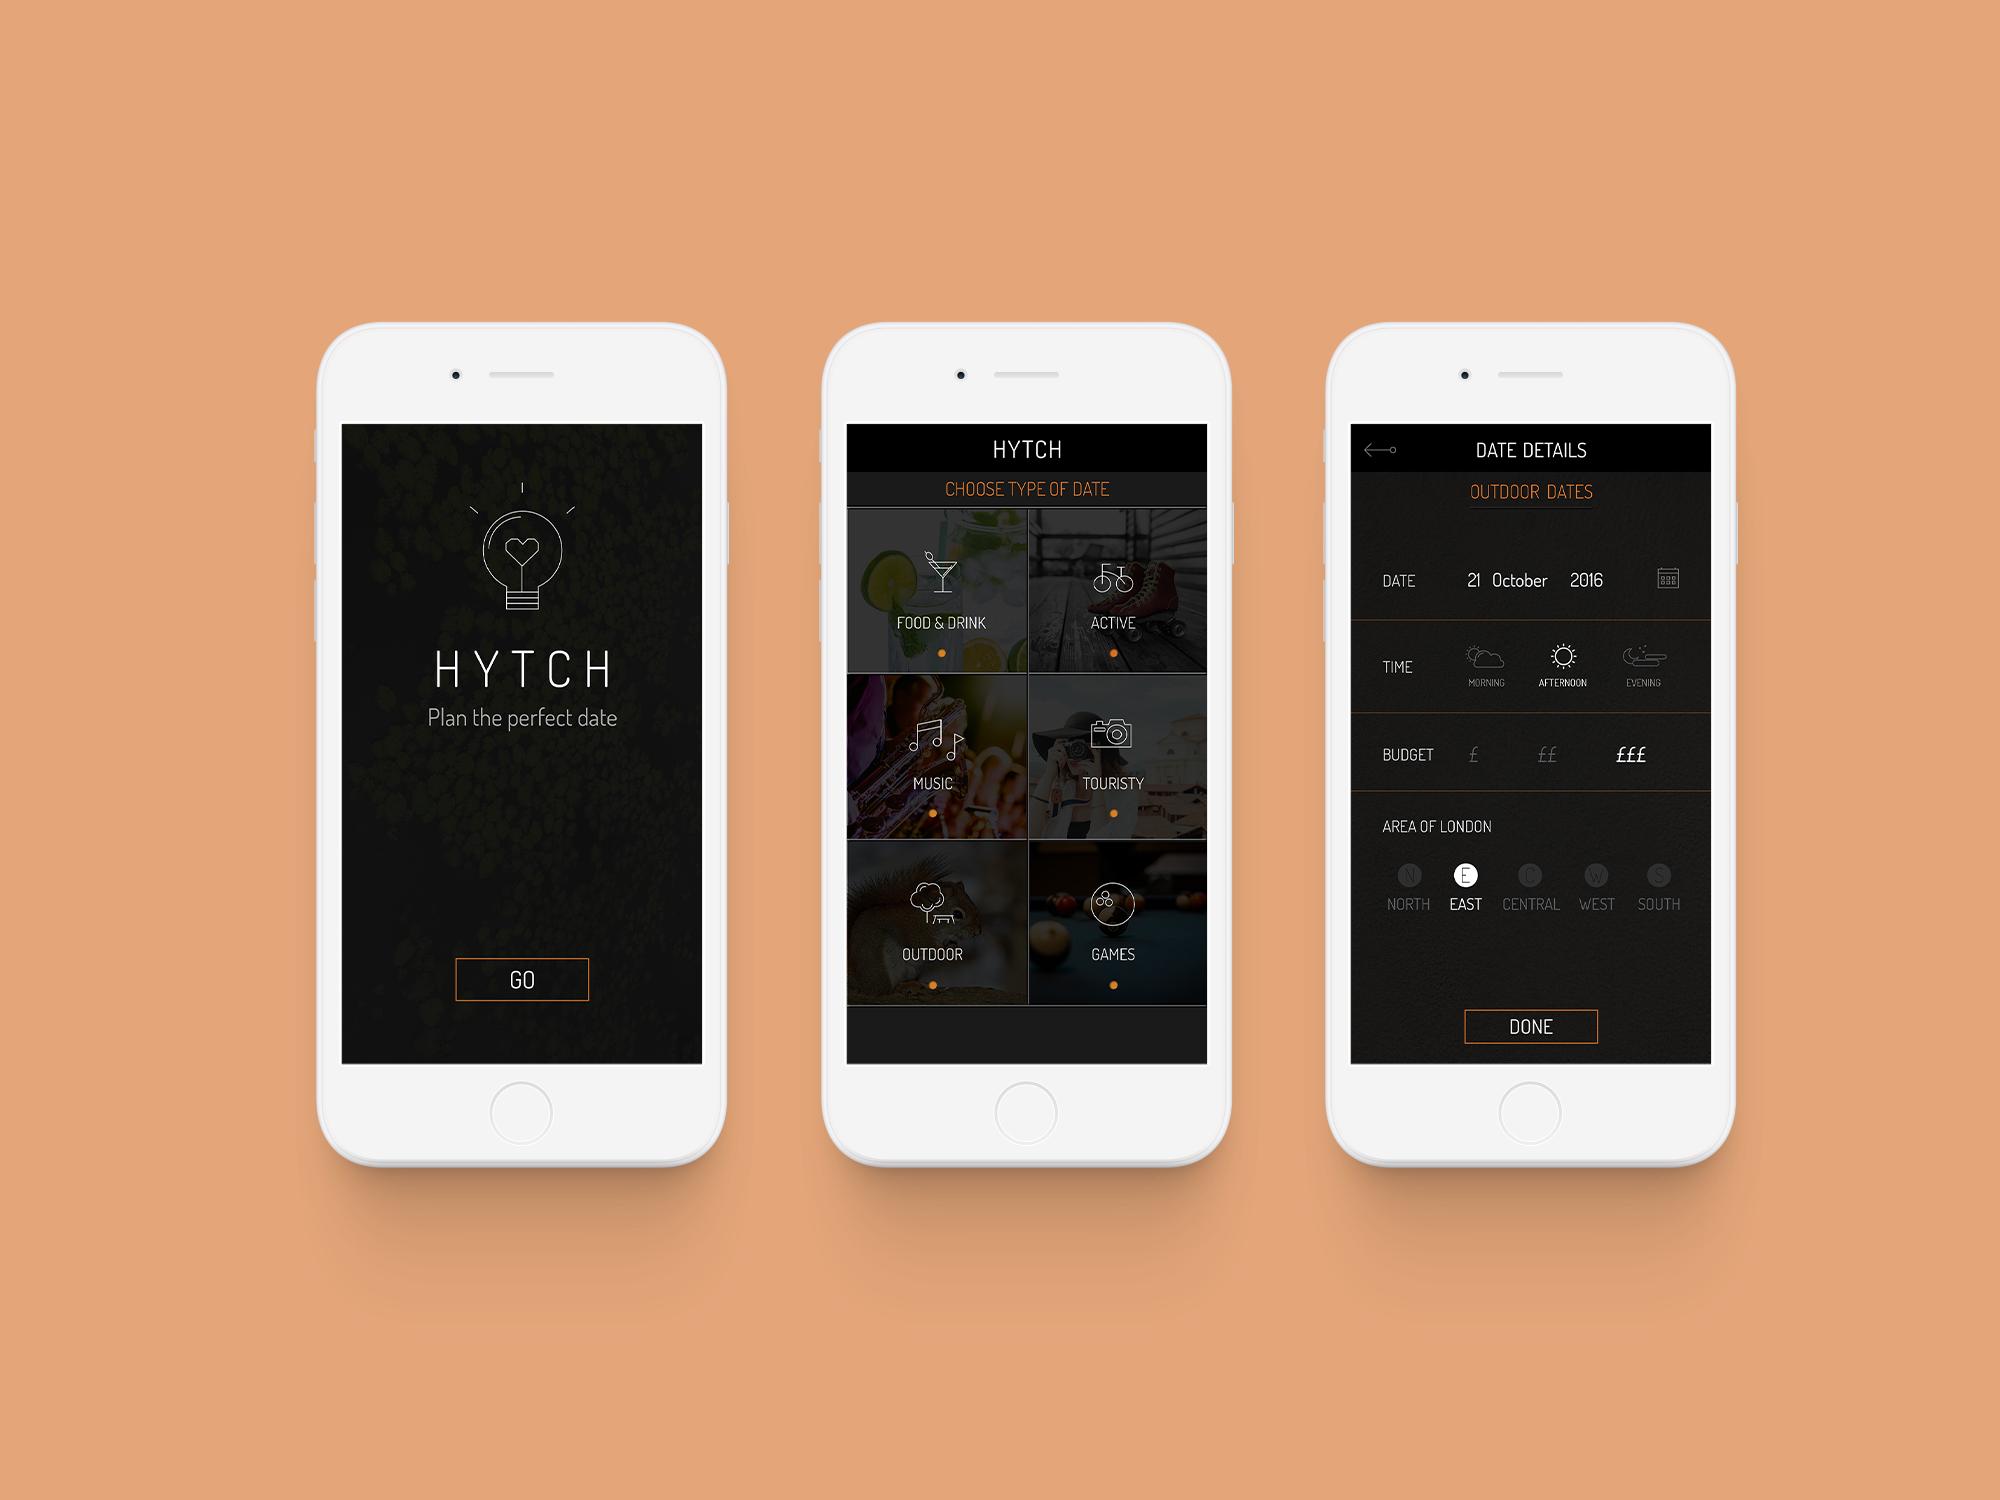 Hytch-case.png